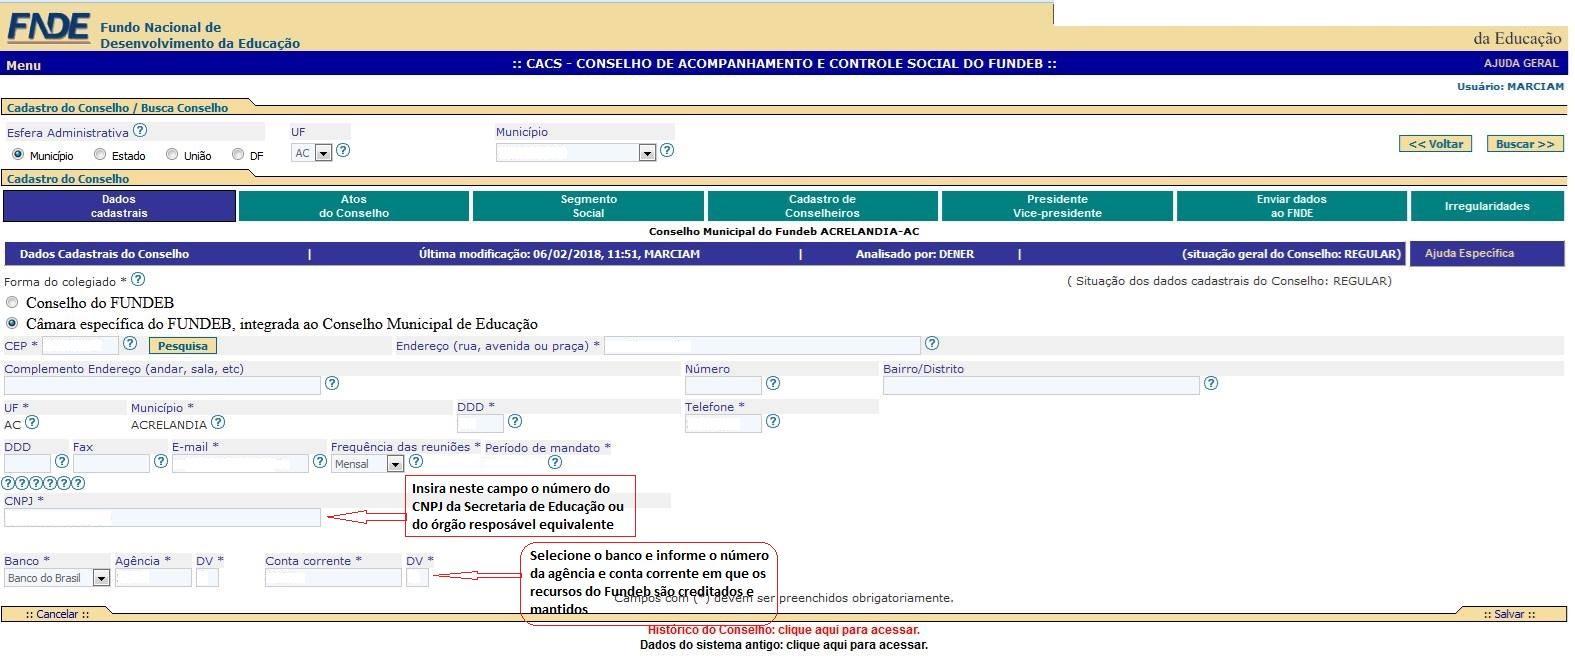 Aviso CACS-Fundeb - Portaria Conjunta